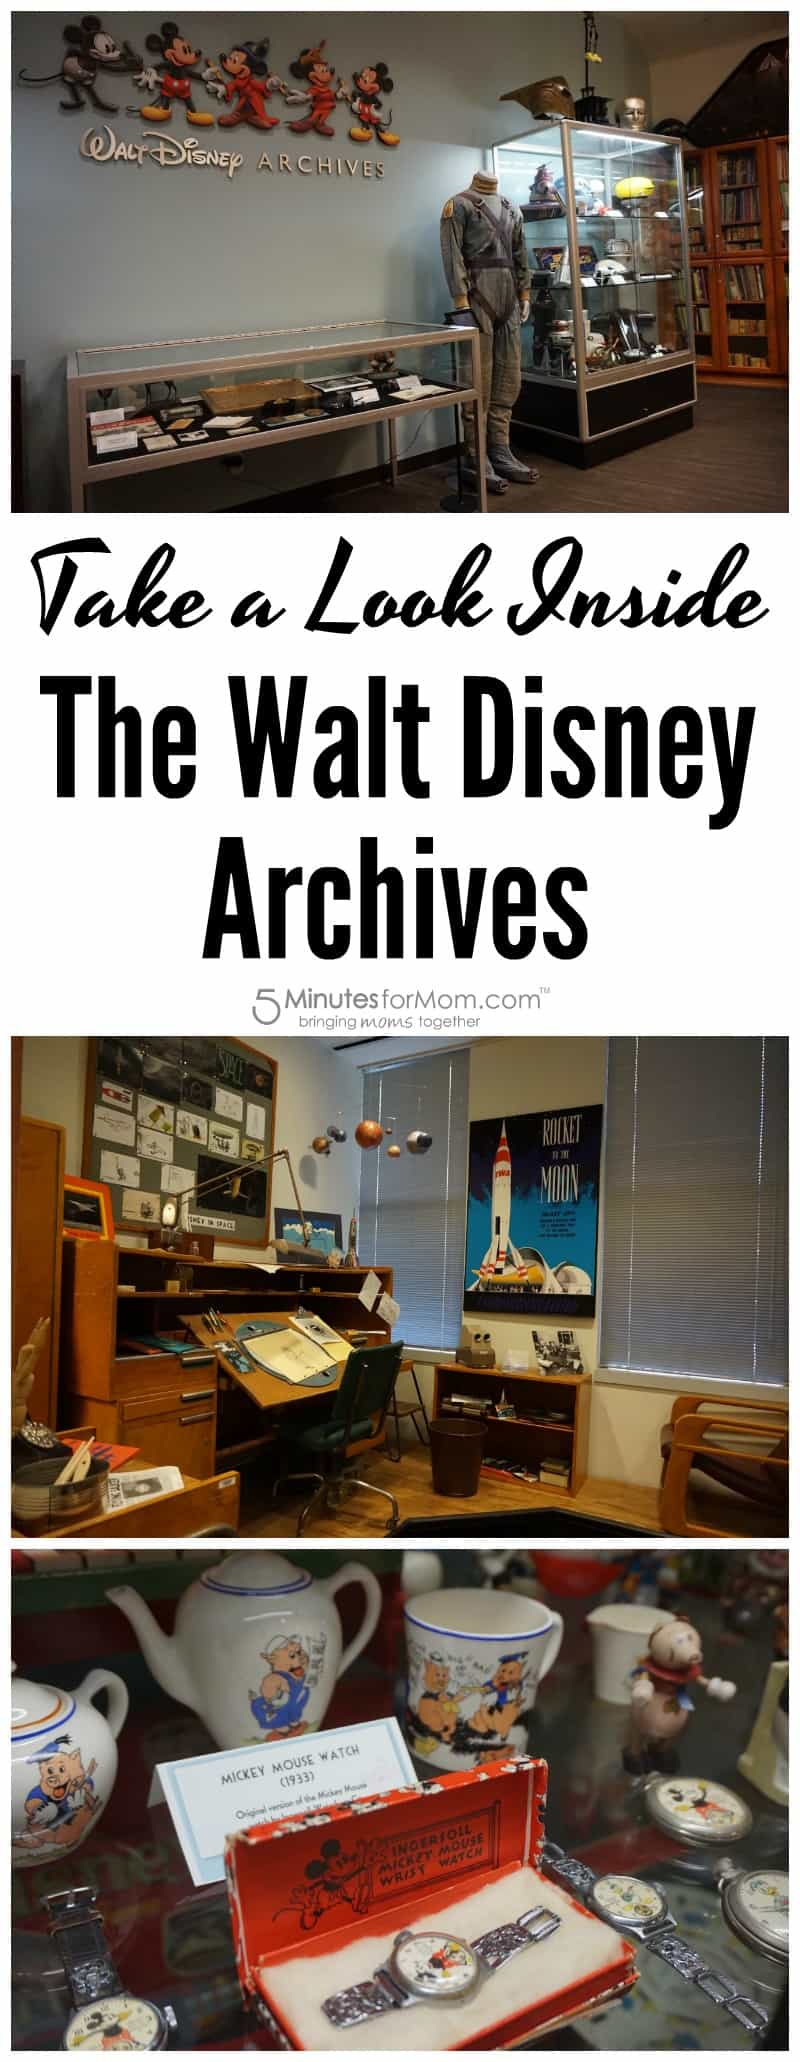 Take A Look Inside The Walt Disney Archives